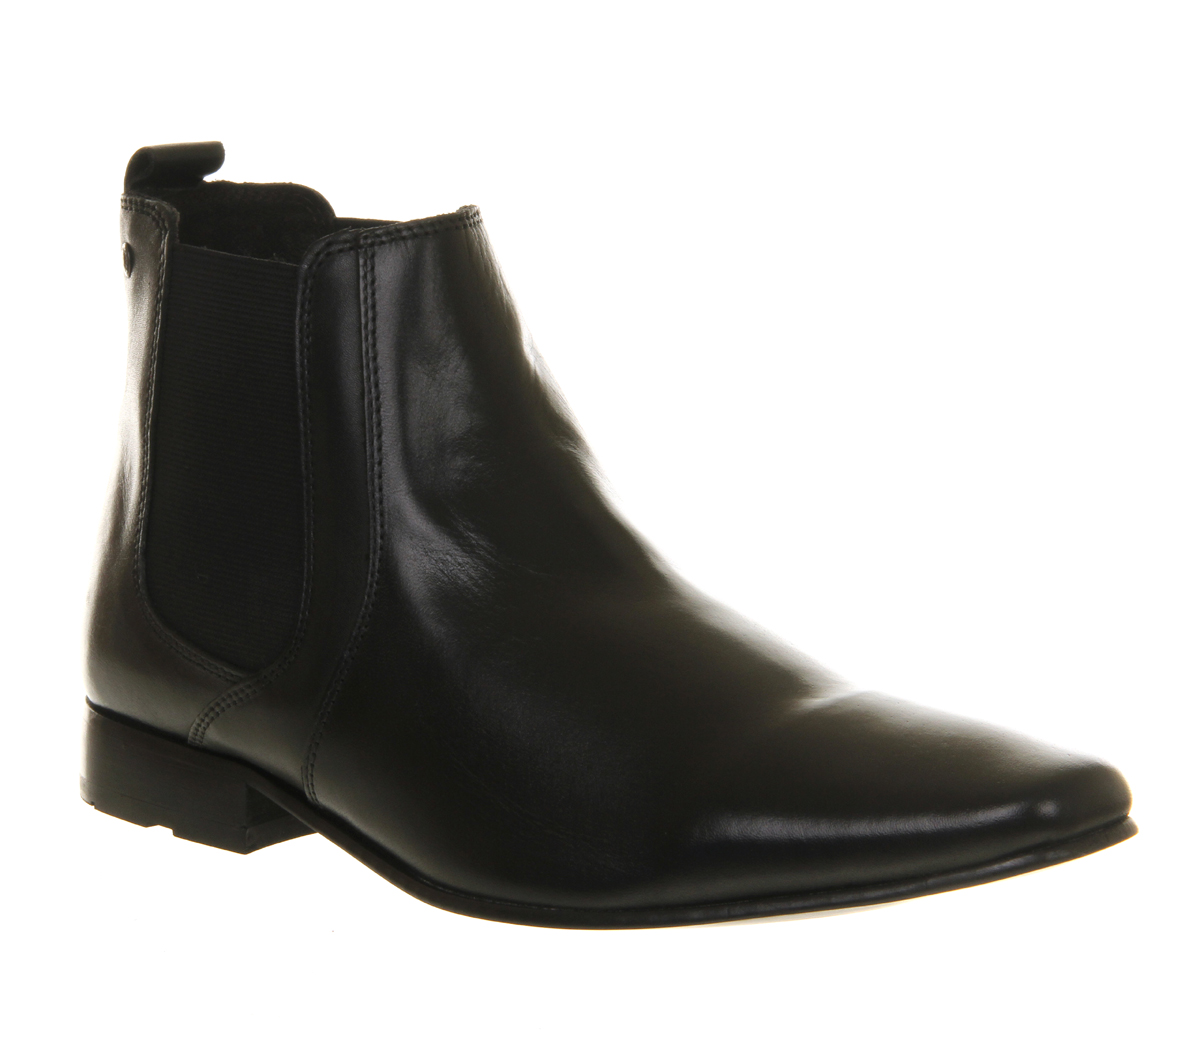 mens base arthur chelsea boot black leather boots ebay